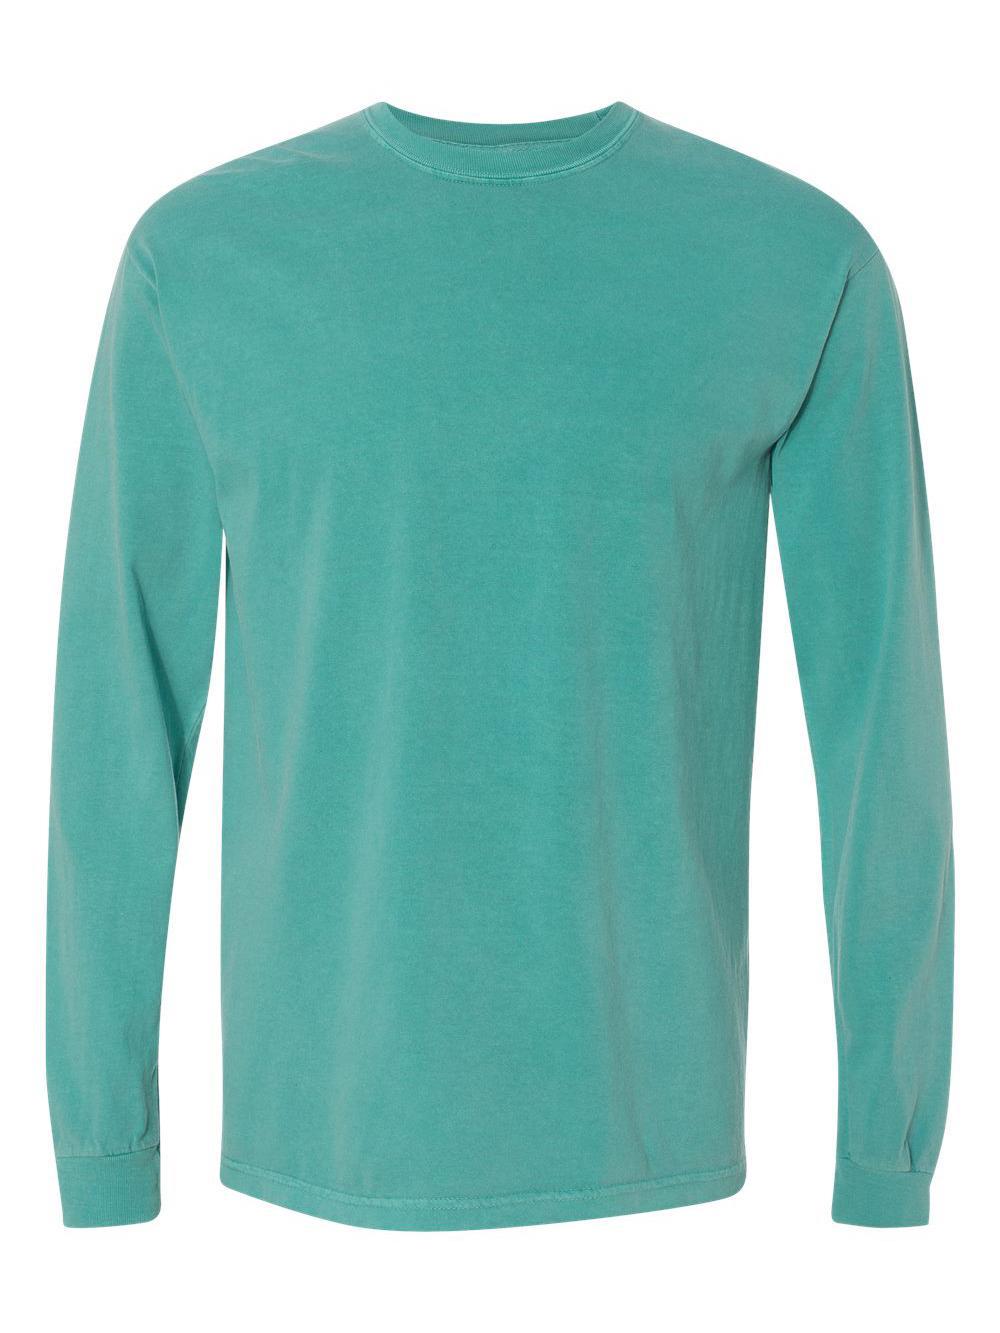 Comfort-Colors-Garment-Dyed-Heavyweight-Ringspun-Long-Sleeve-T-Shirt-6014 thumbnail 60